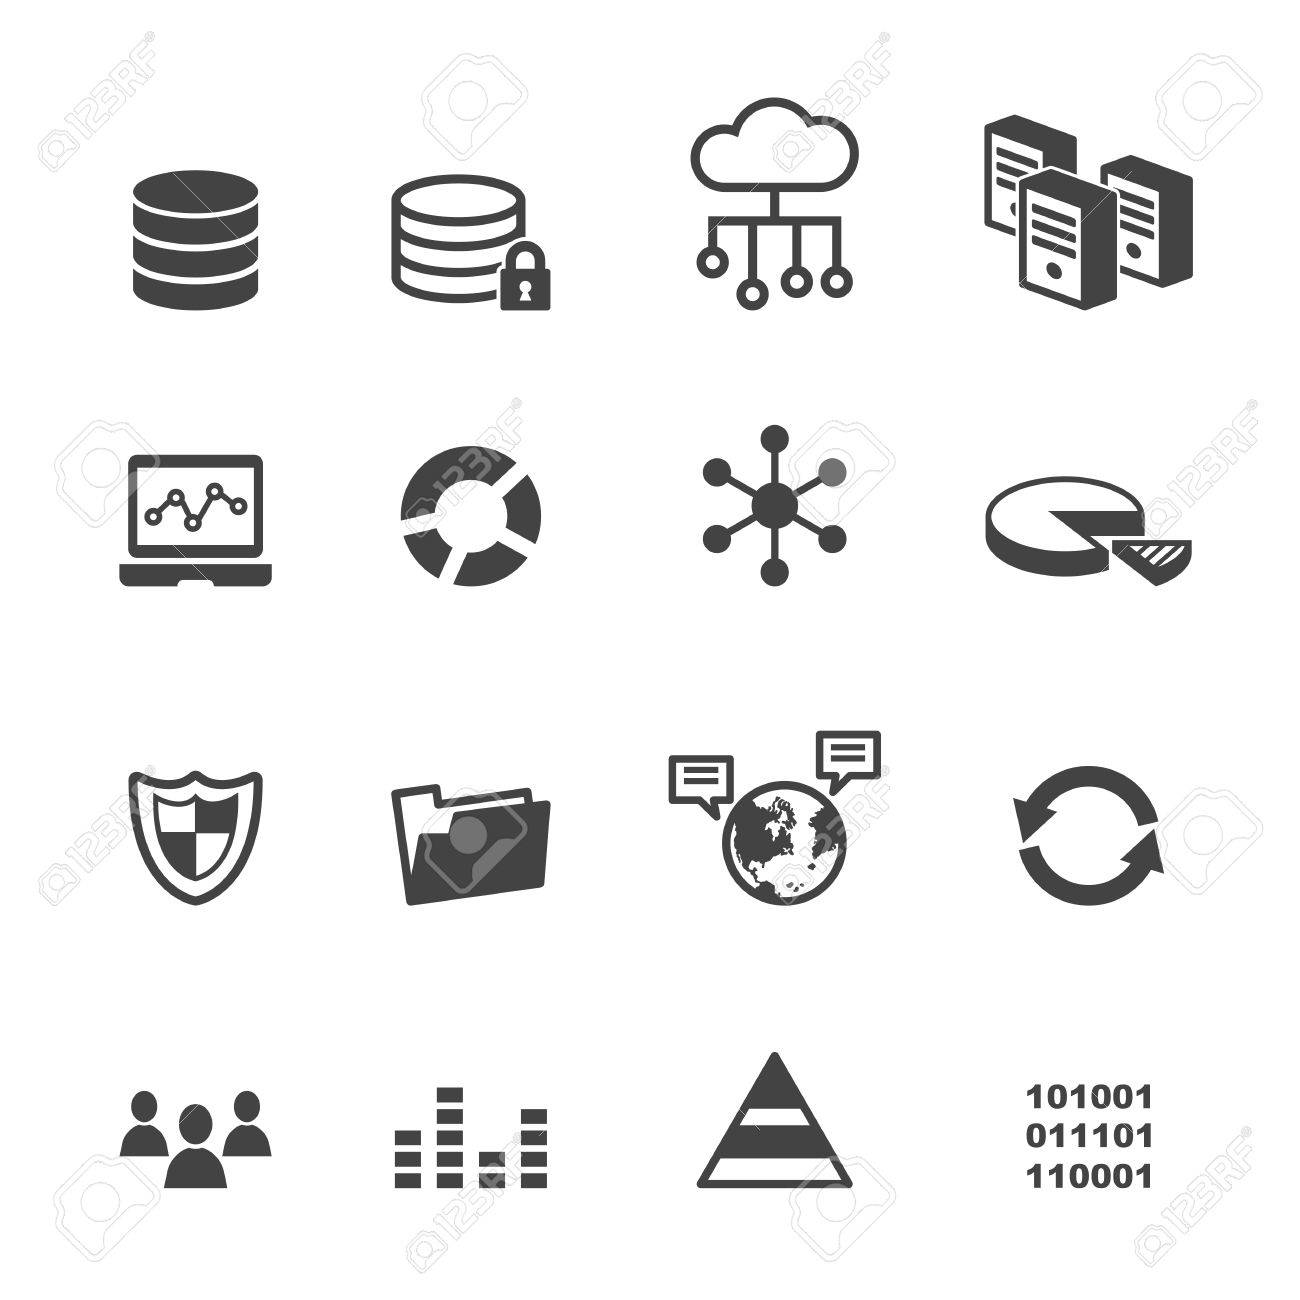 Data icons mono vector symbols royalty free cliparts vectors data icons mono vector symbols stock vector 40031489 biocorpaavc